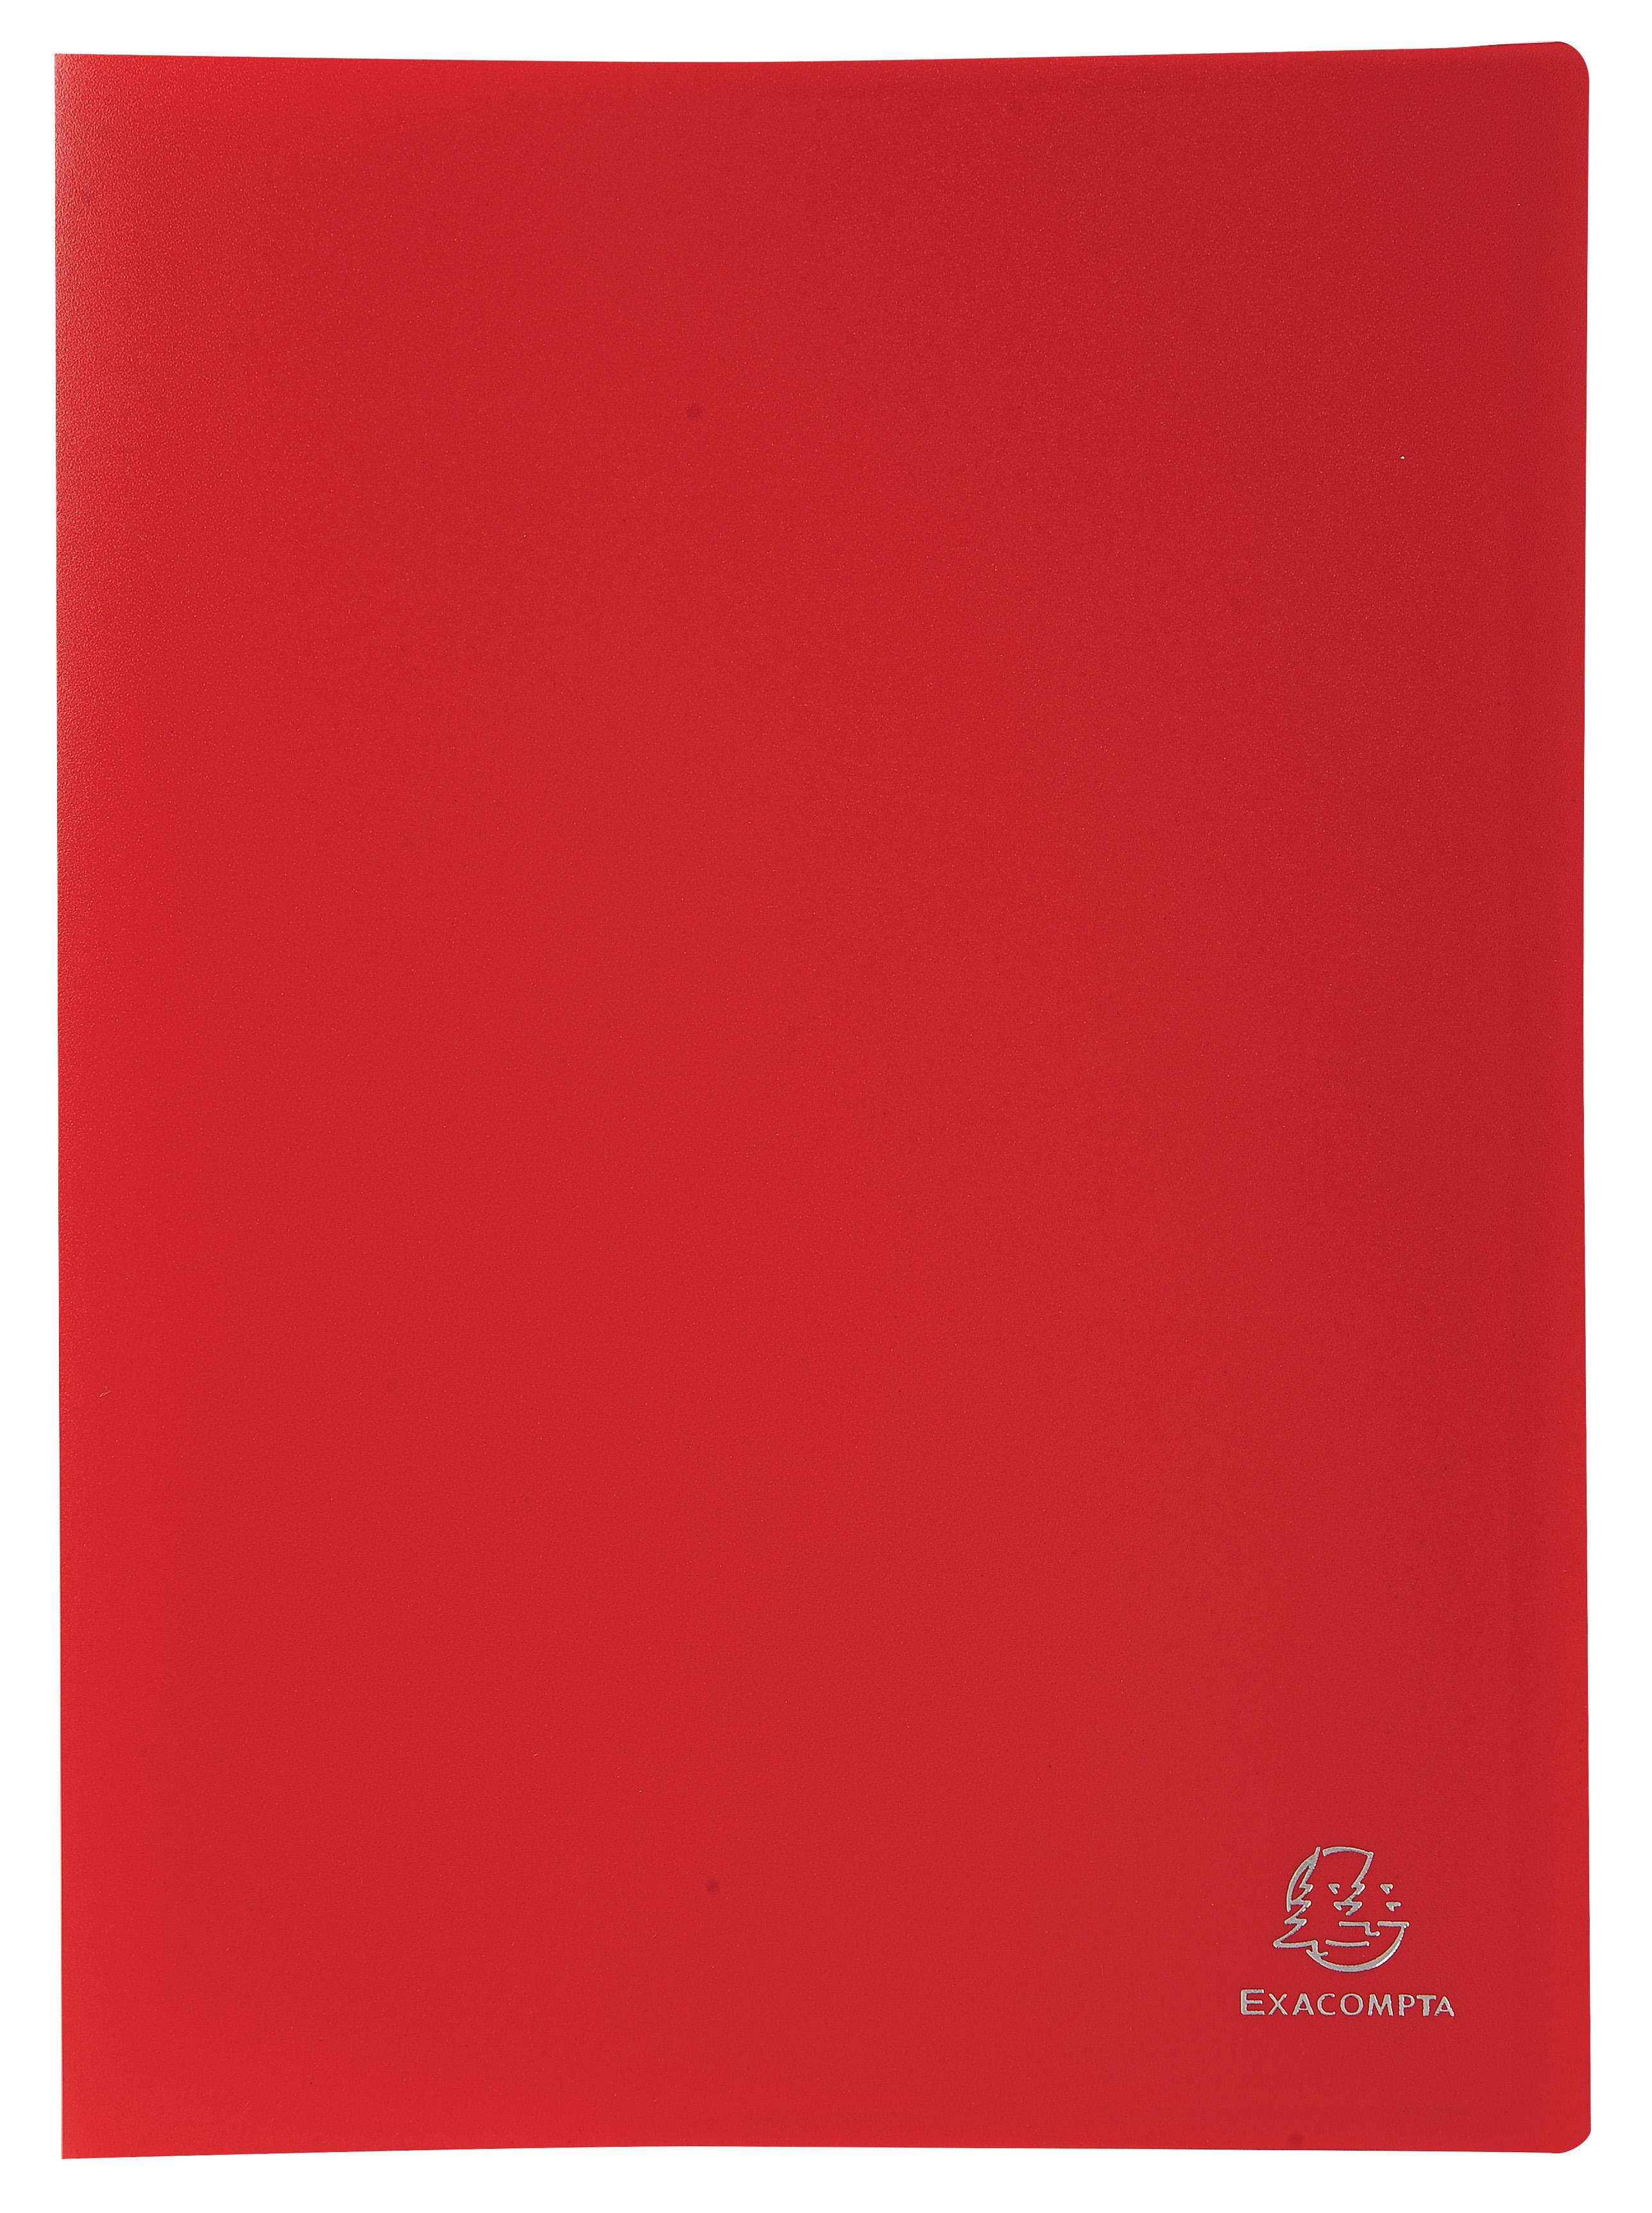 Exacompta A4 Display Book Soft Eco Polypropylene 40 Pocket Red